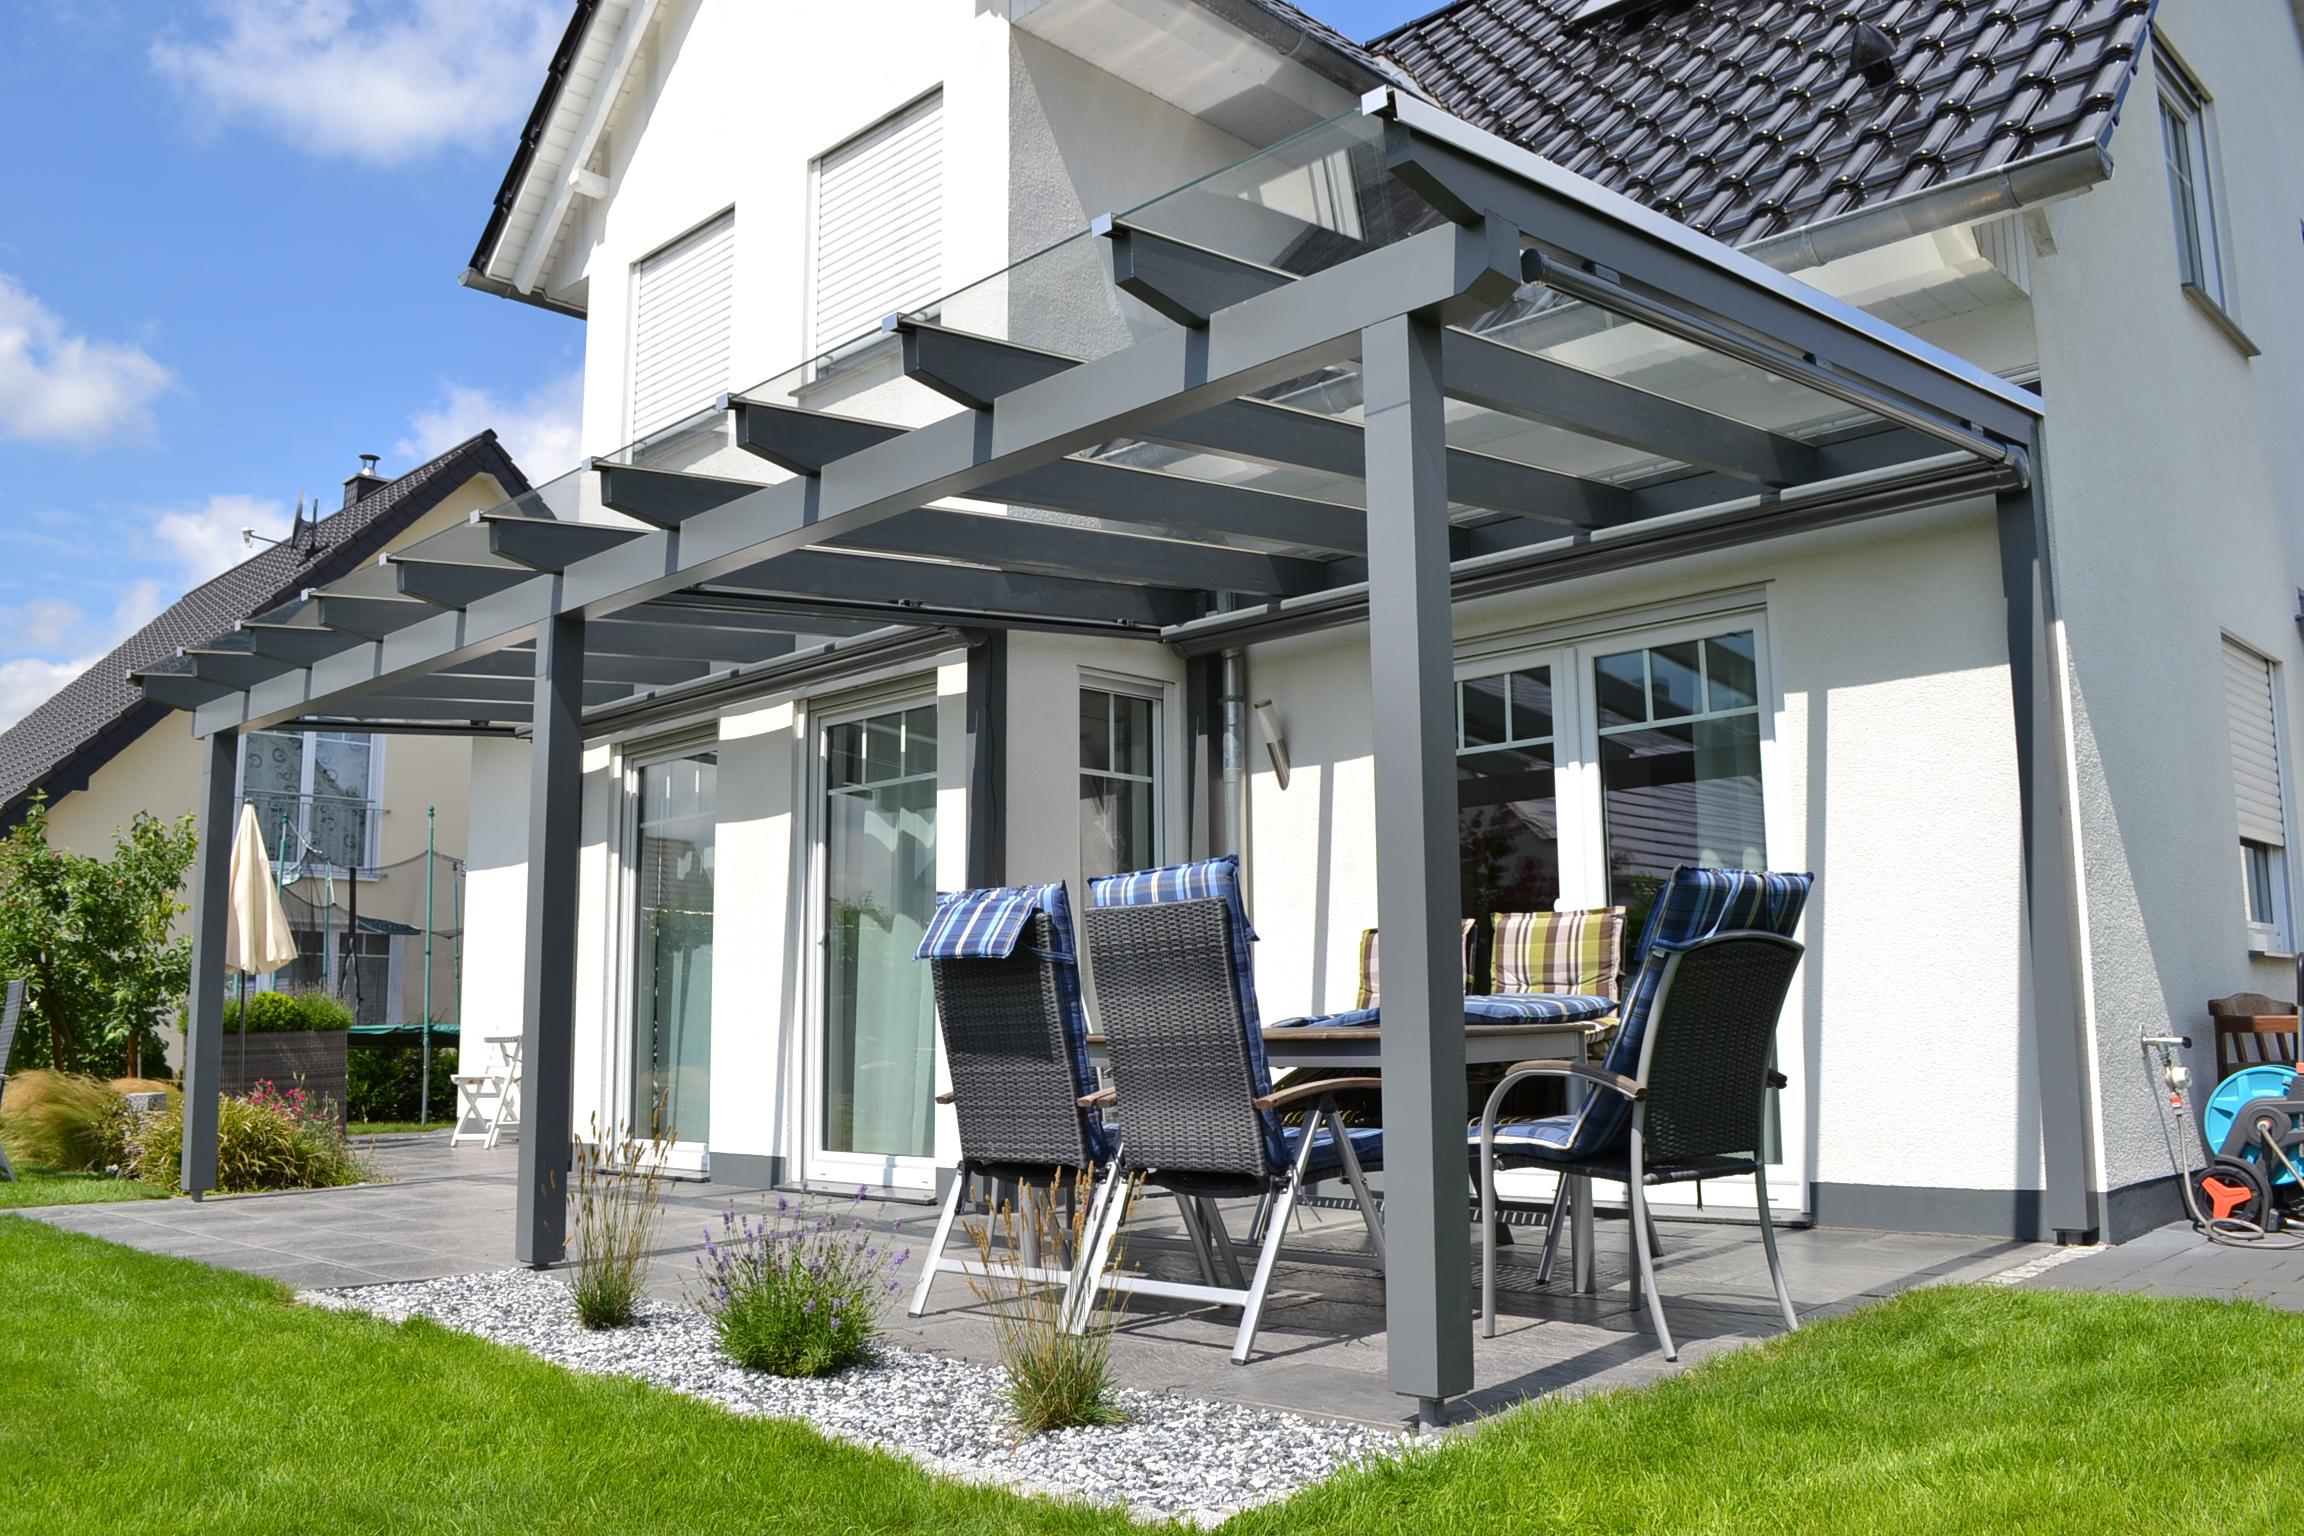 terrassen berdachung aus holz mit beschattung pollmeier holzbau gmbh. Black Bedroom Furniture Sets. Home Design Ideas